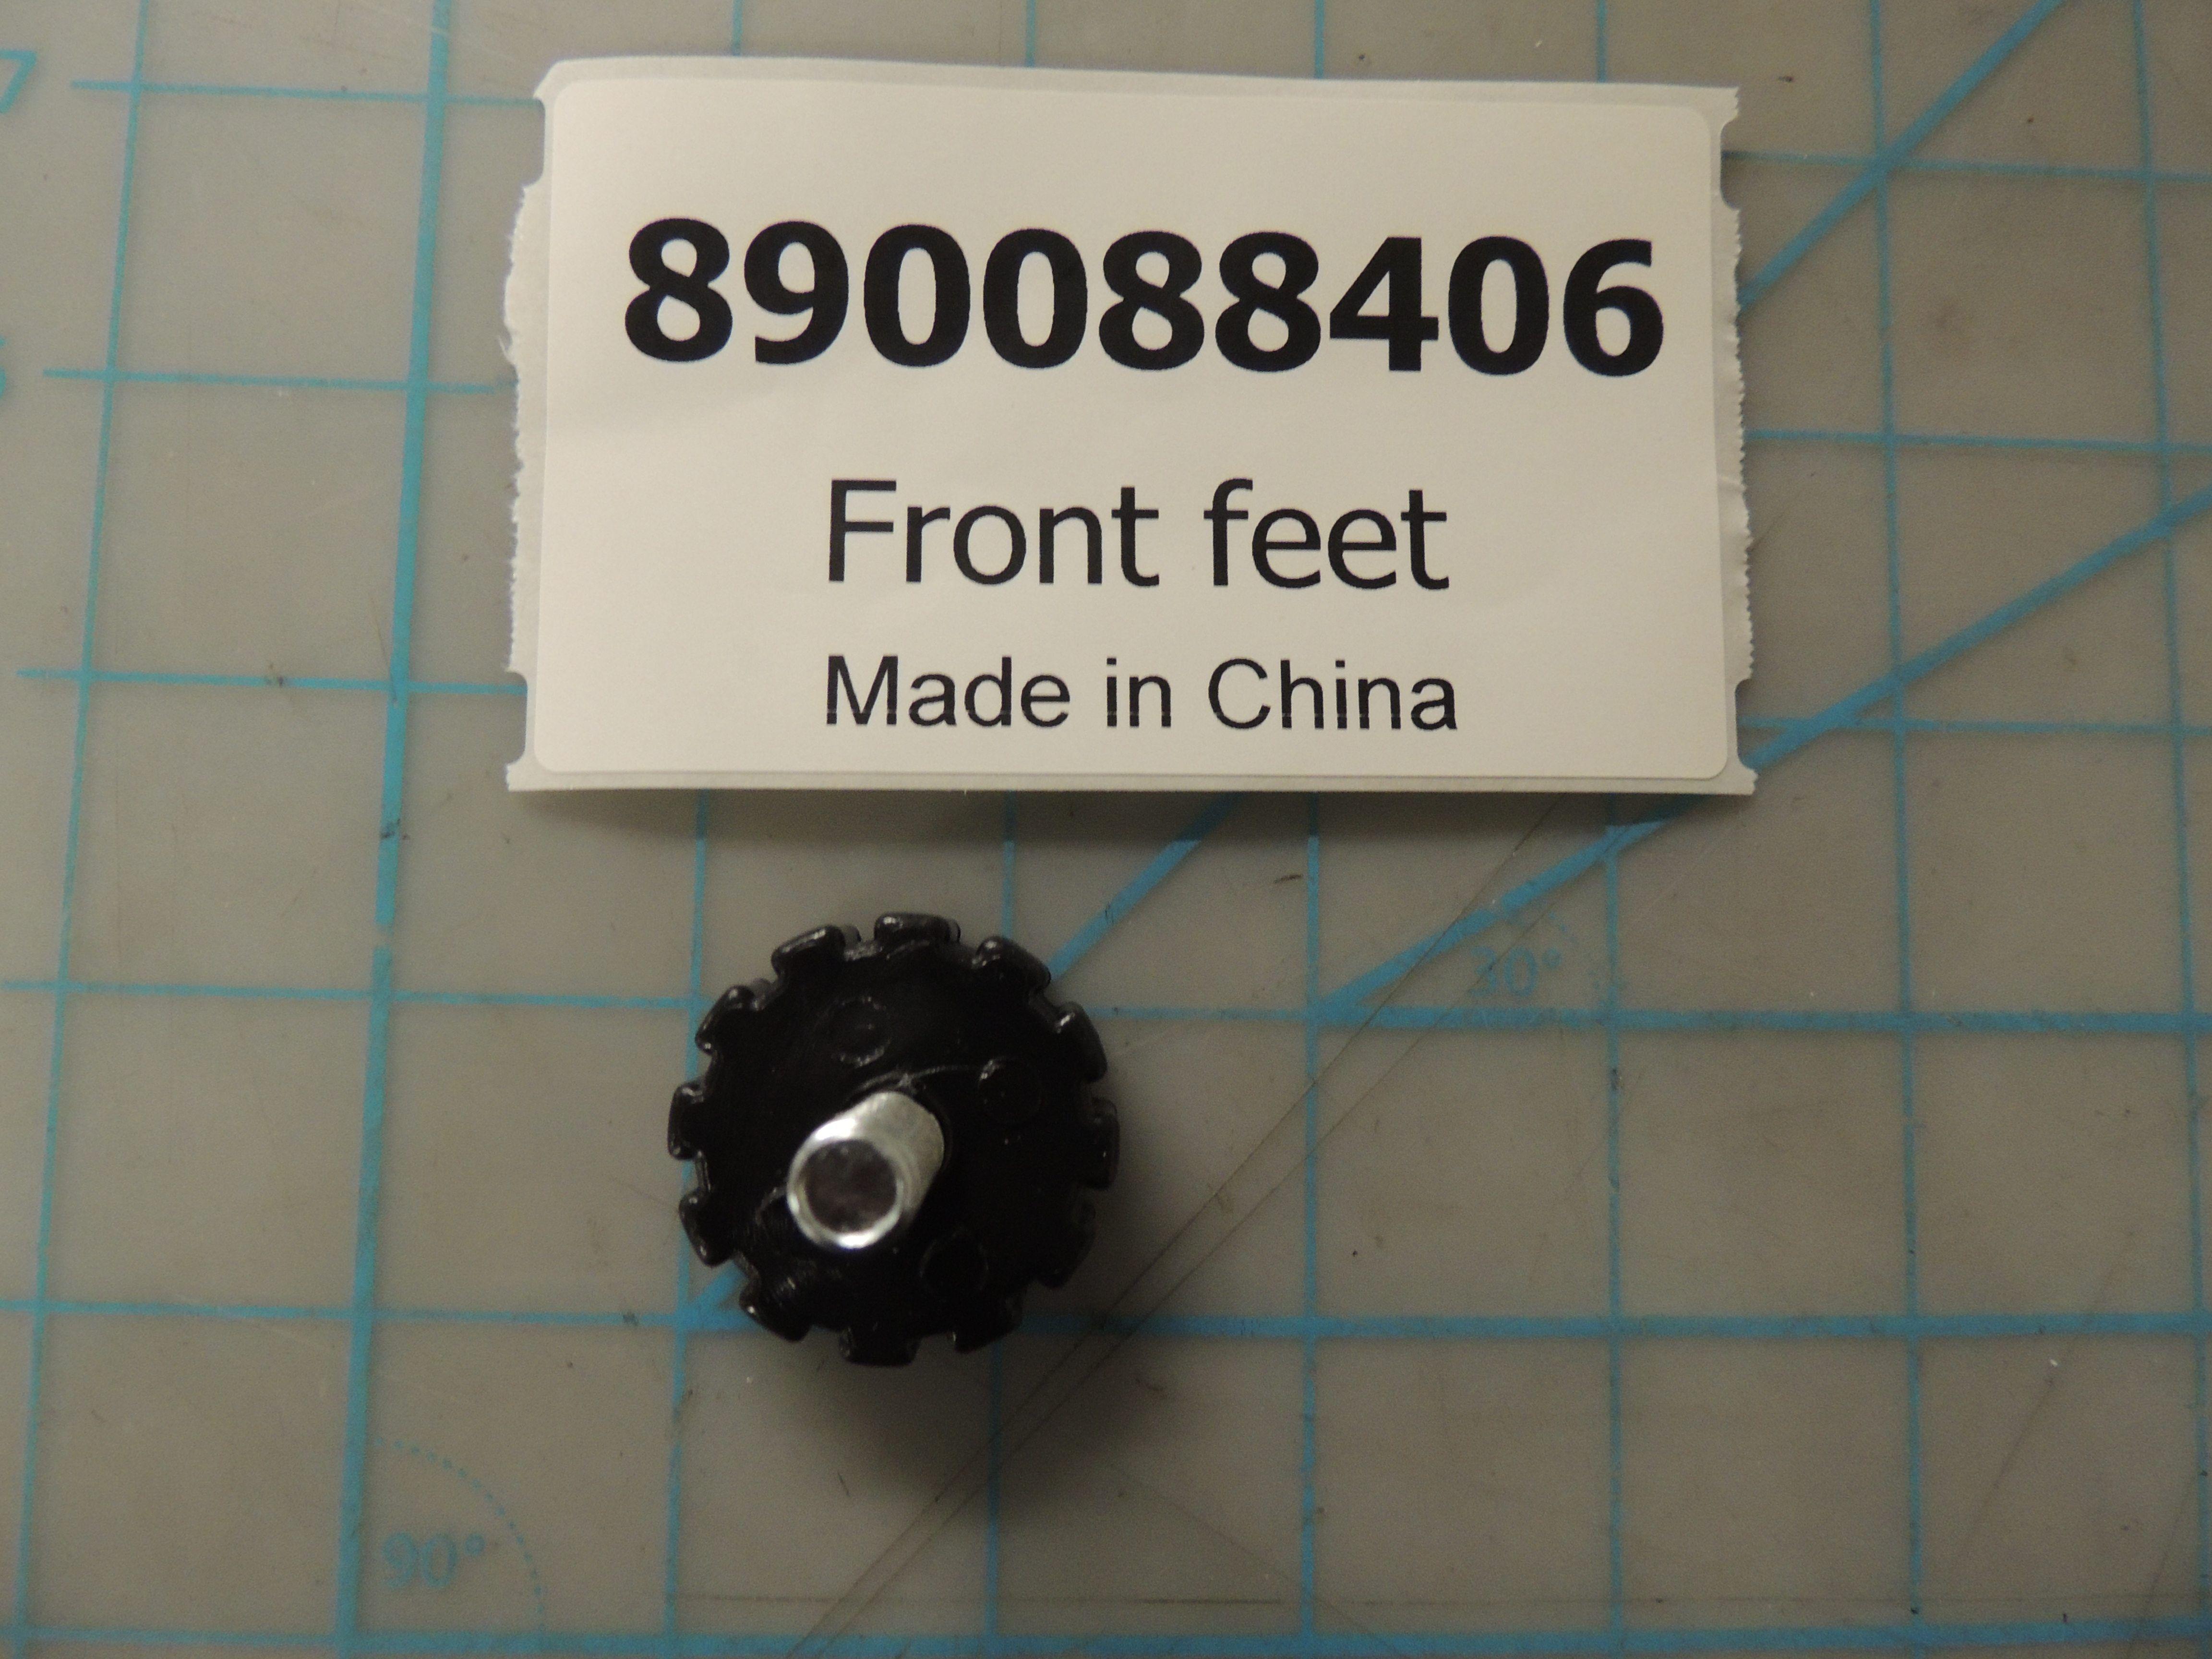 Front feet